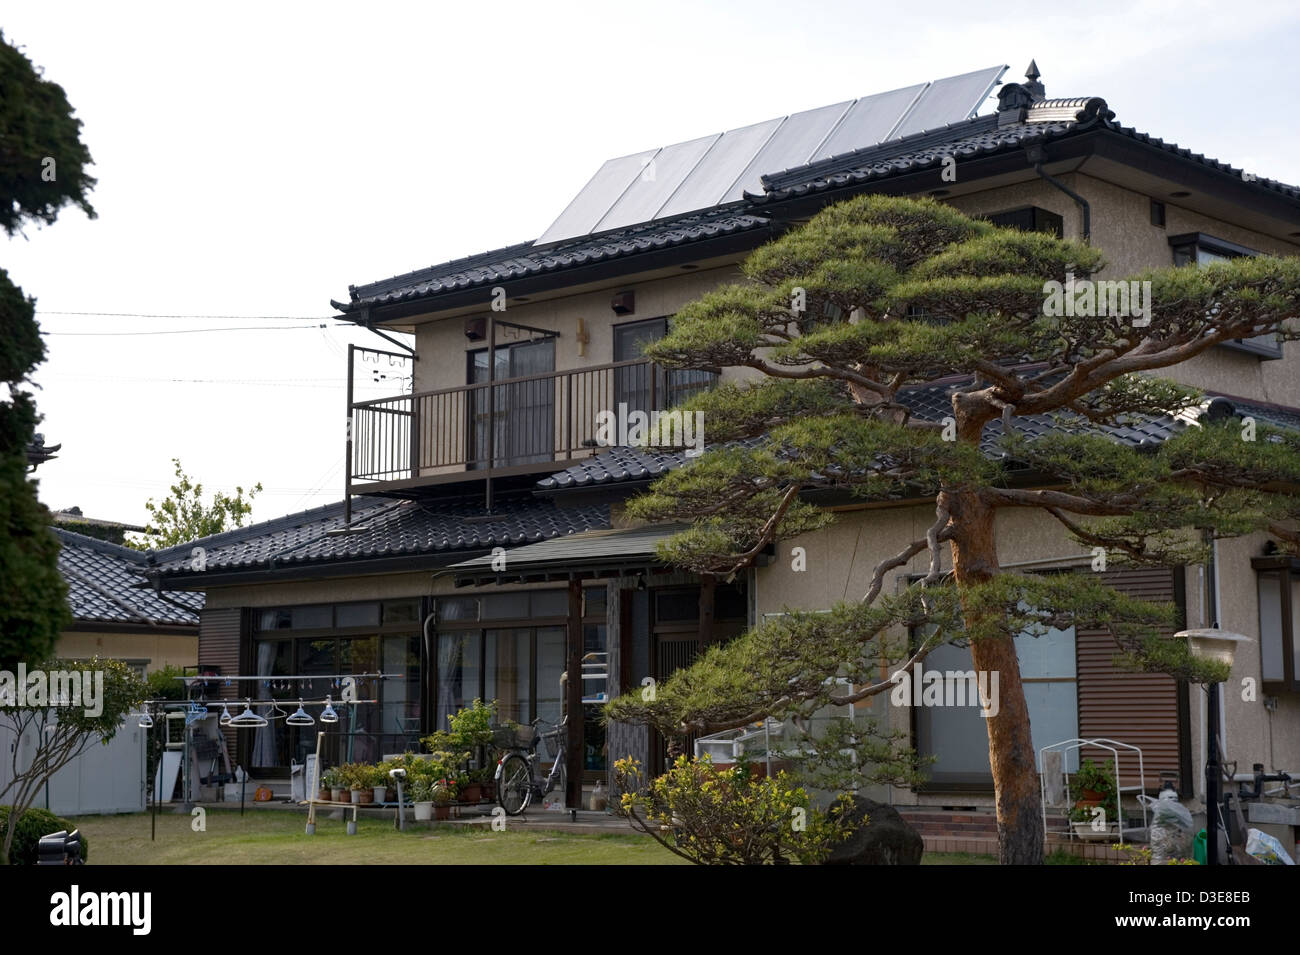 Japanisches Dach ceramic tile roof stockfotos ceramic tile roof bilder